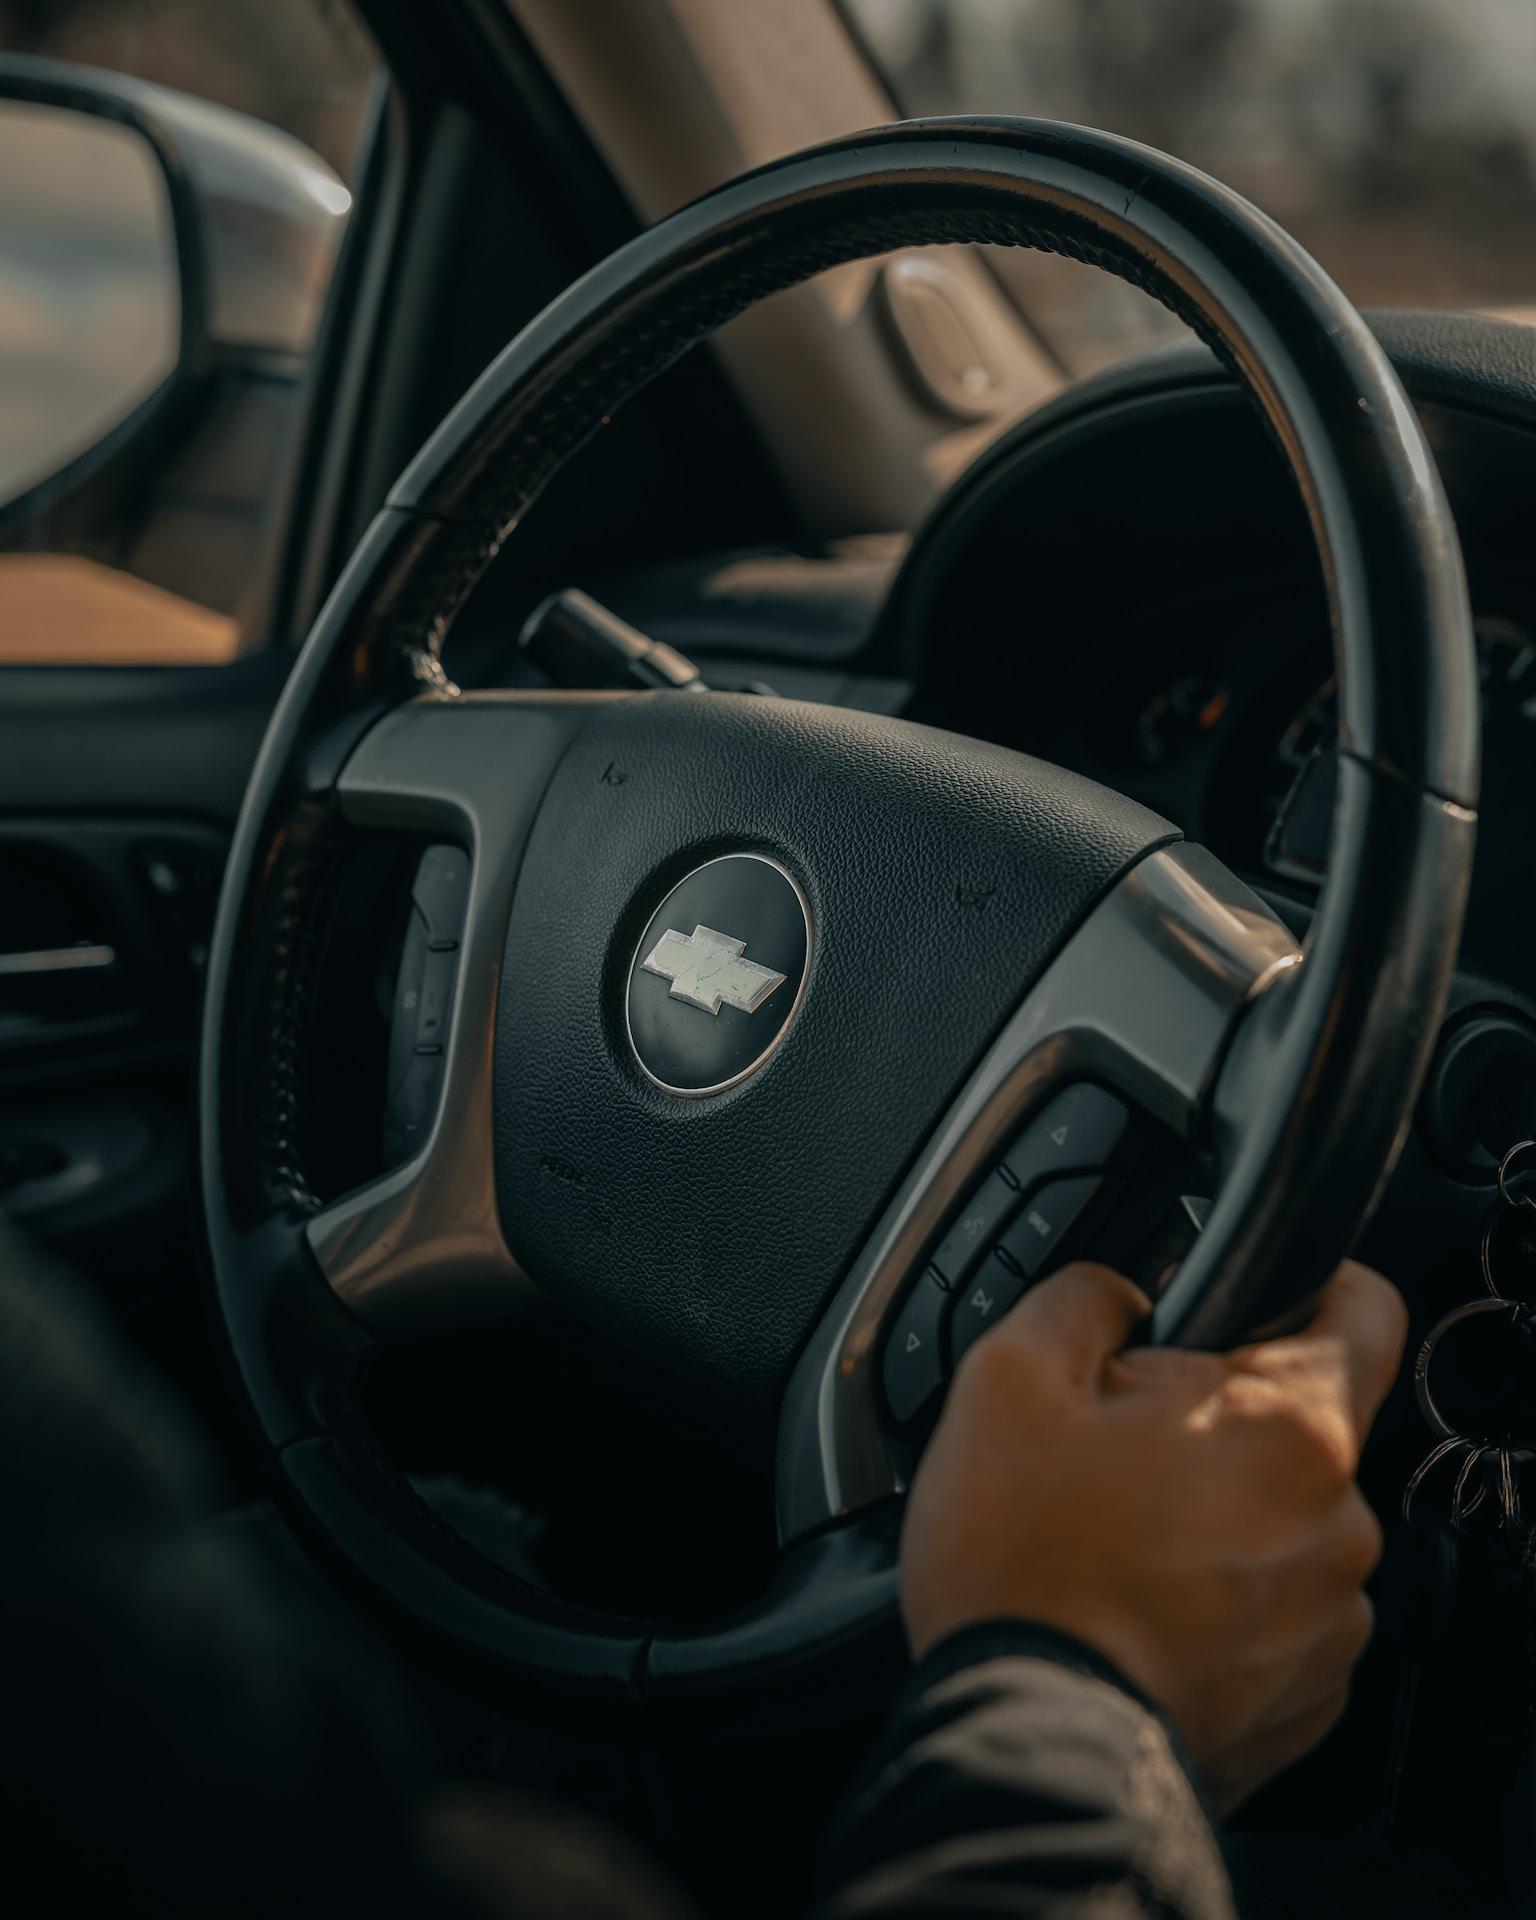 person holding black mercedes benz steering wheel